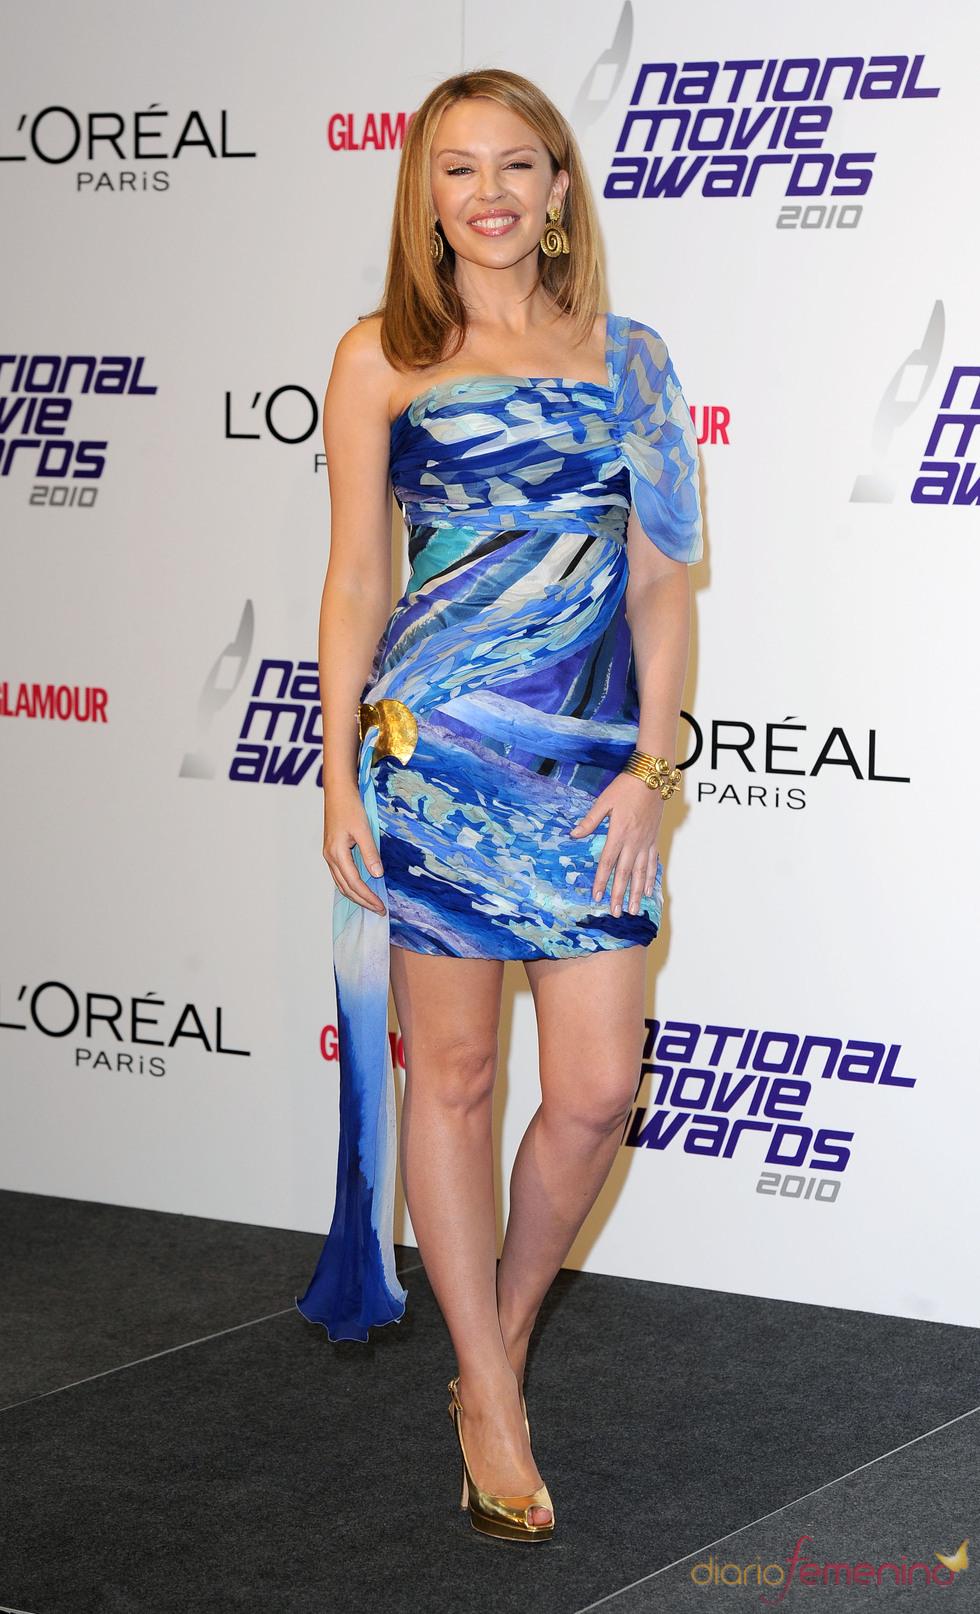 Kylie Minogue en los National Movies Awards 2010